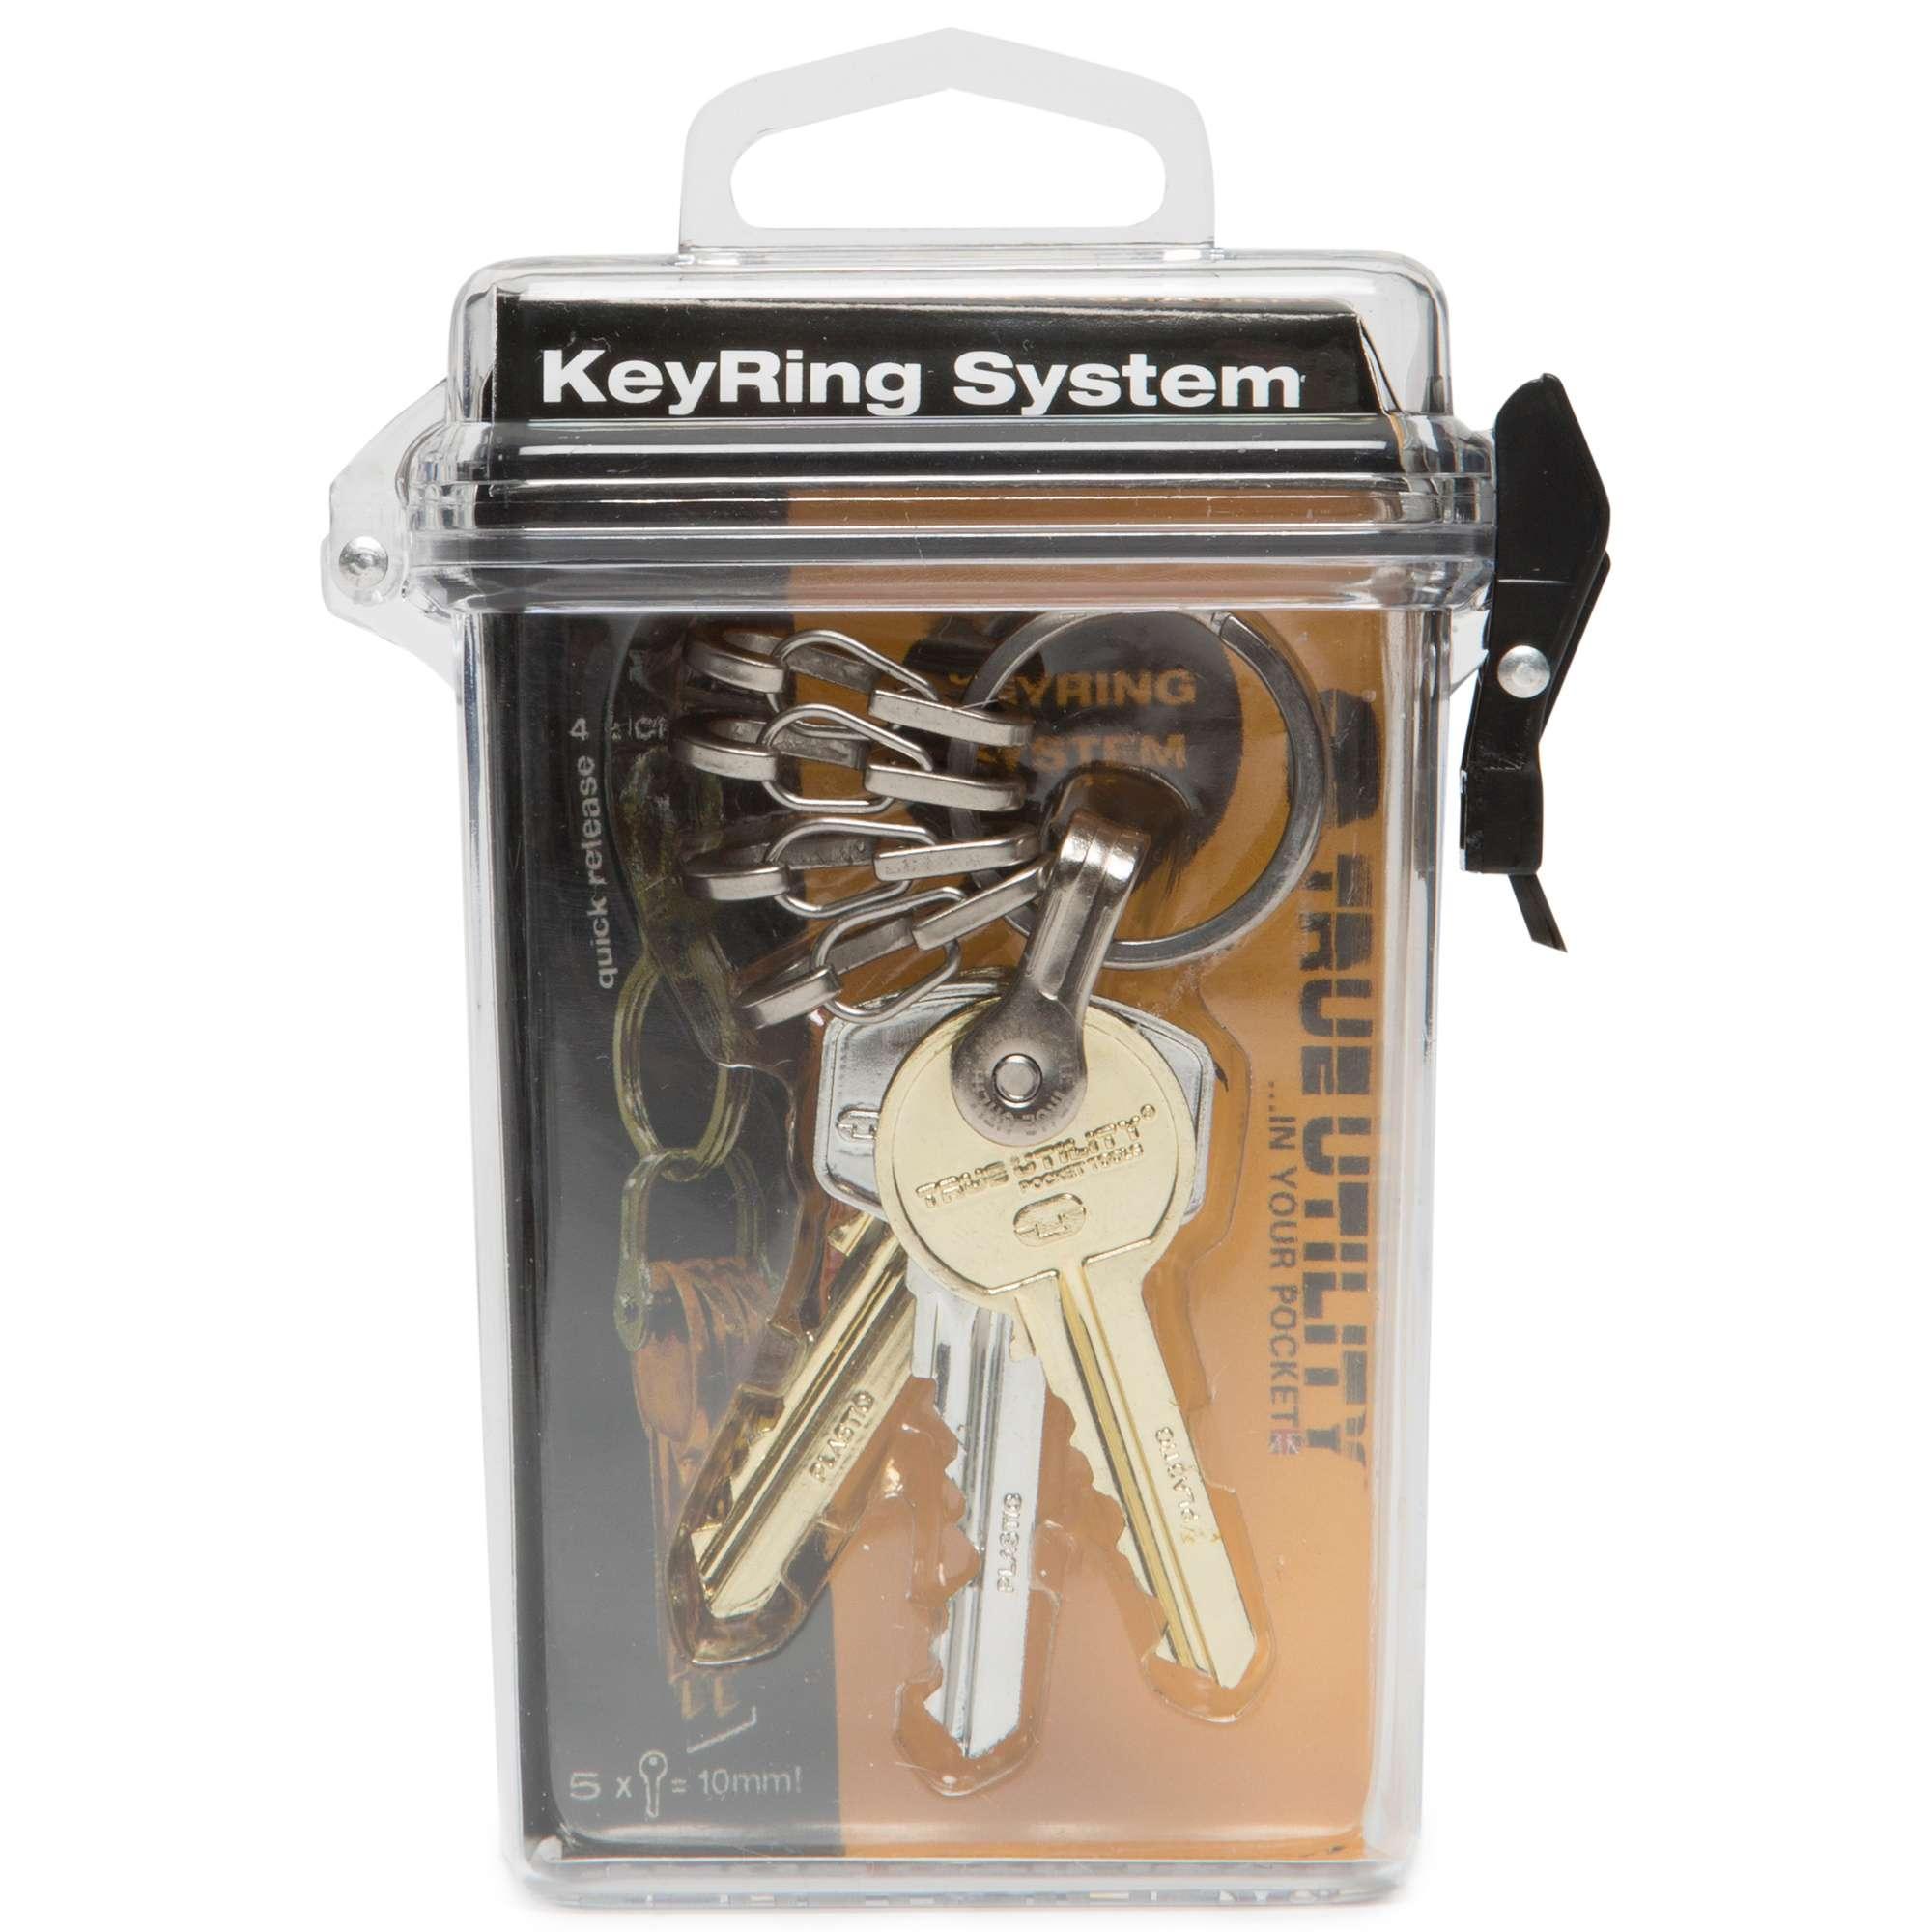 TRUE UTILITY Keyring System